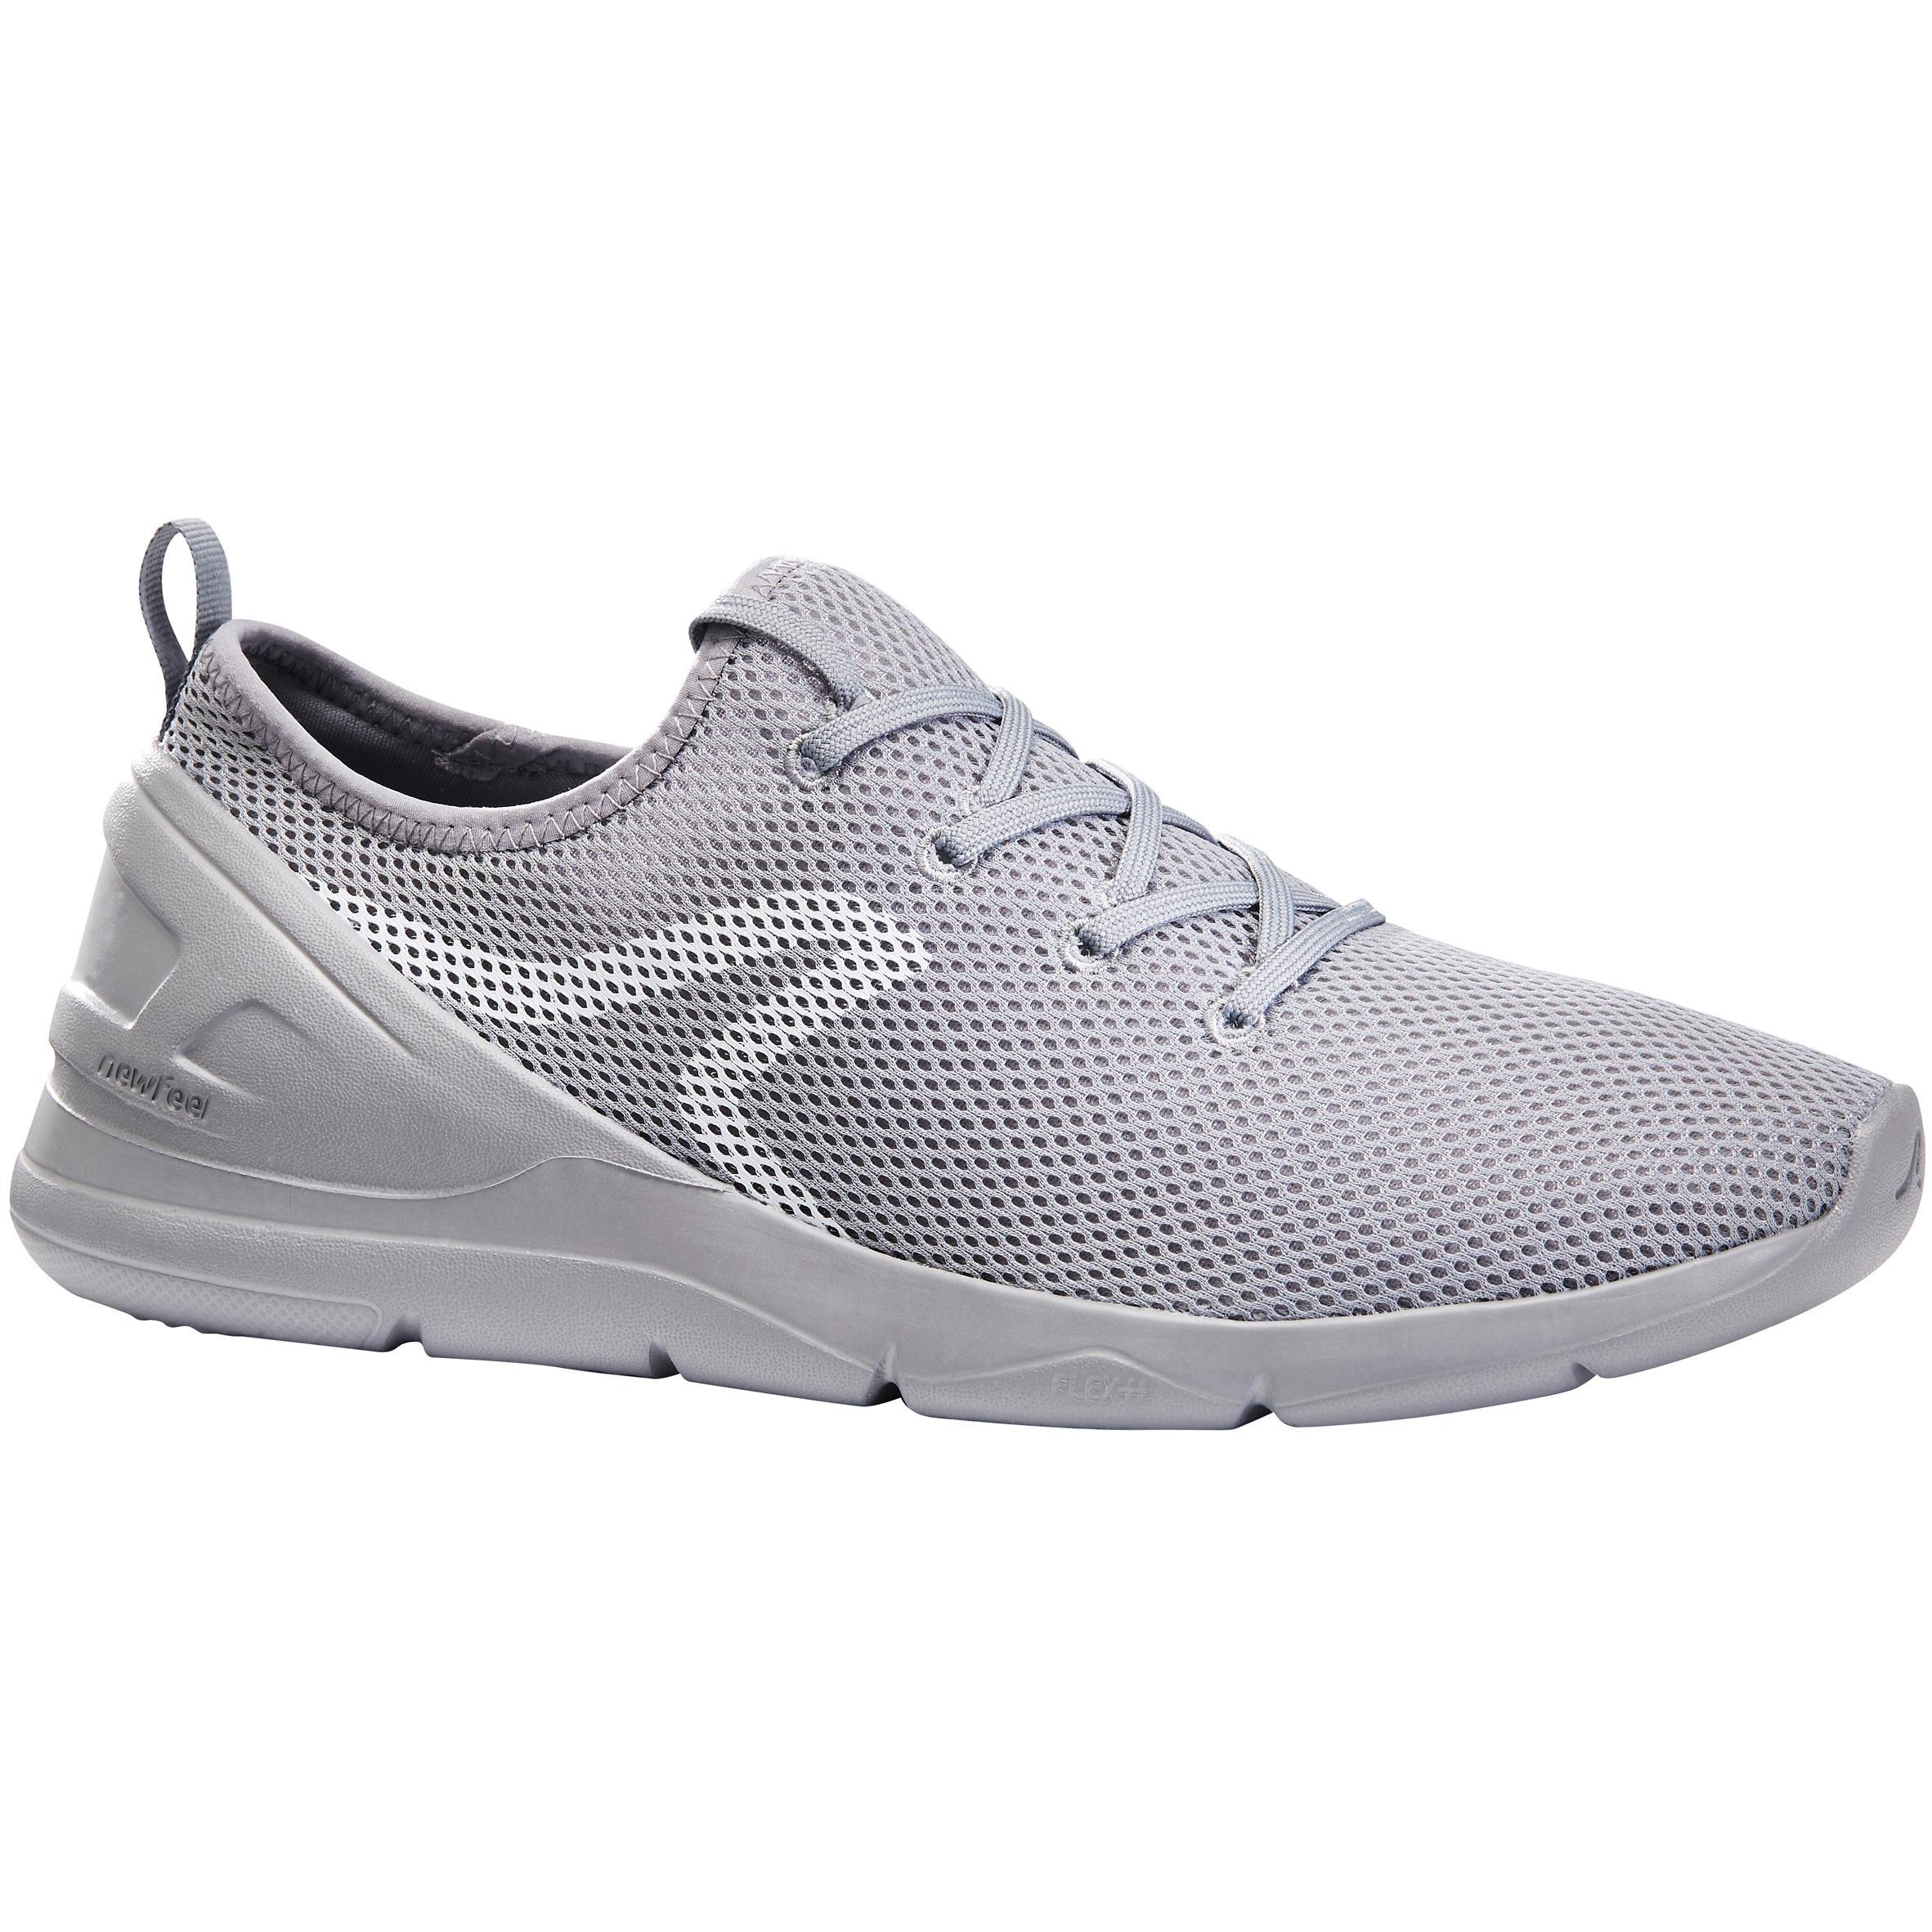 Walkingschuhe PW 100 Herren grau | Schuhe > Sportschuhe > Walkingschuhe | Newfeel